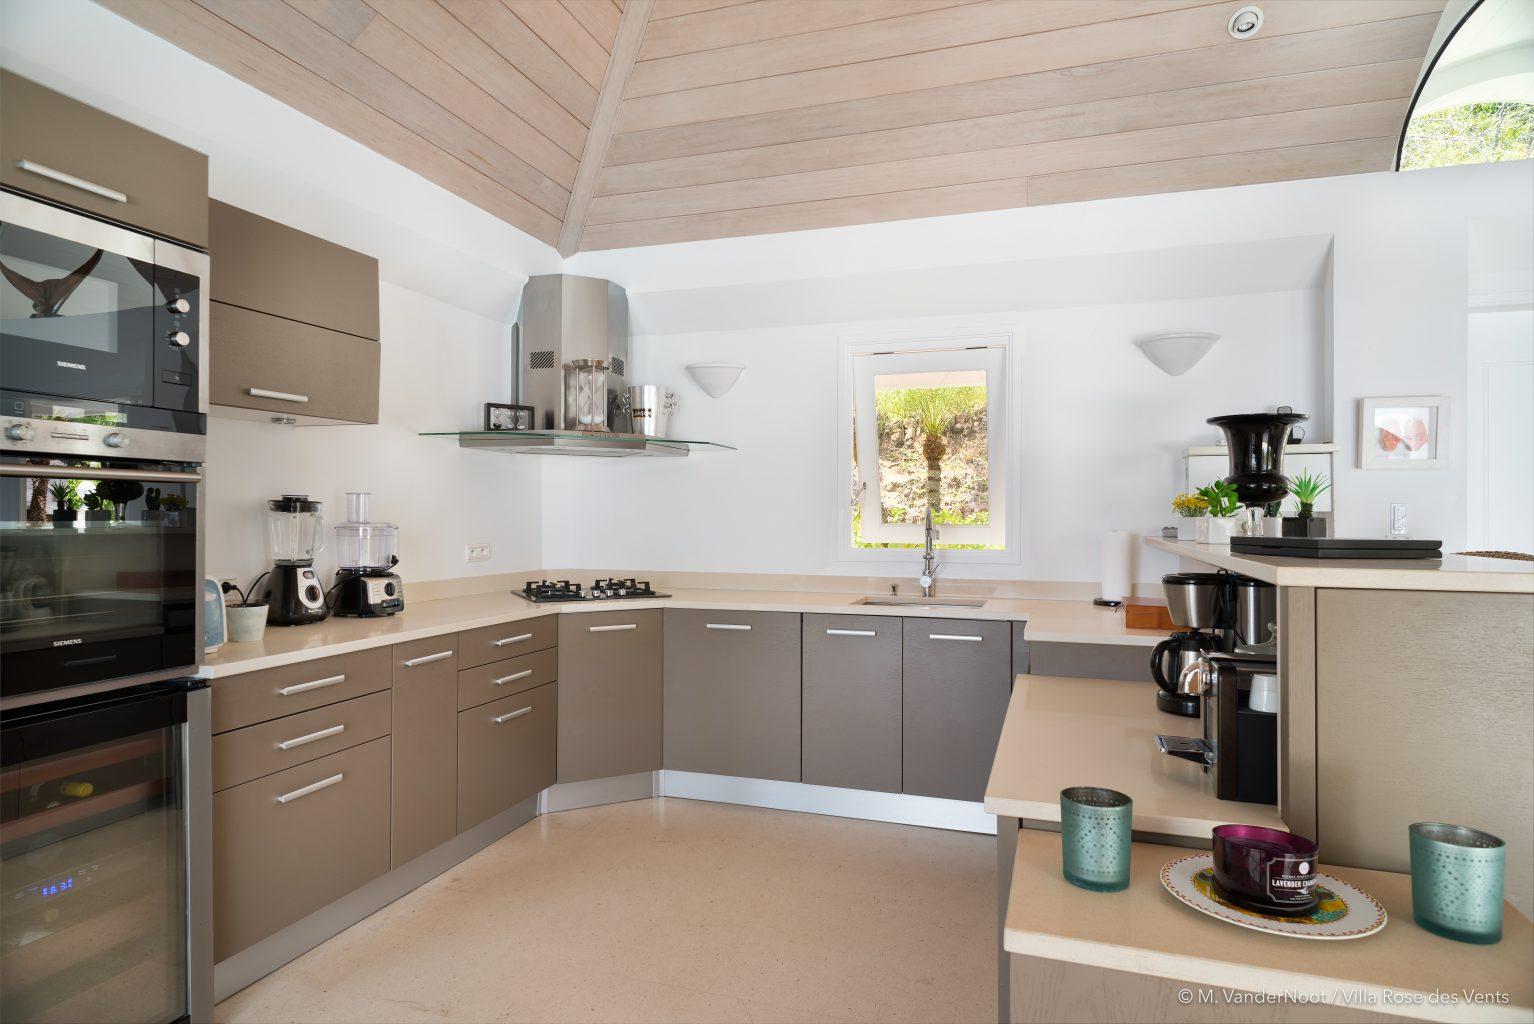 Villa Rose des Vents - Caribbean Villa Rental St Barth with Jacuzzi - Kitchen